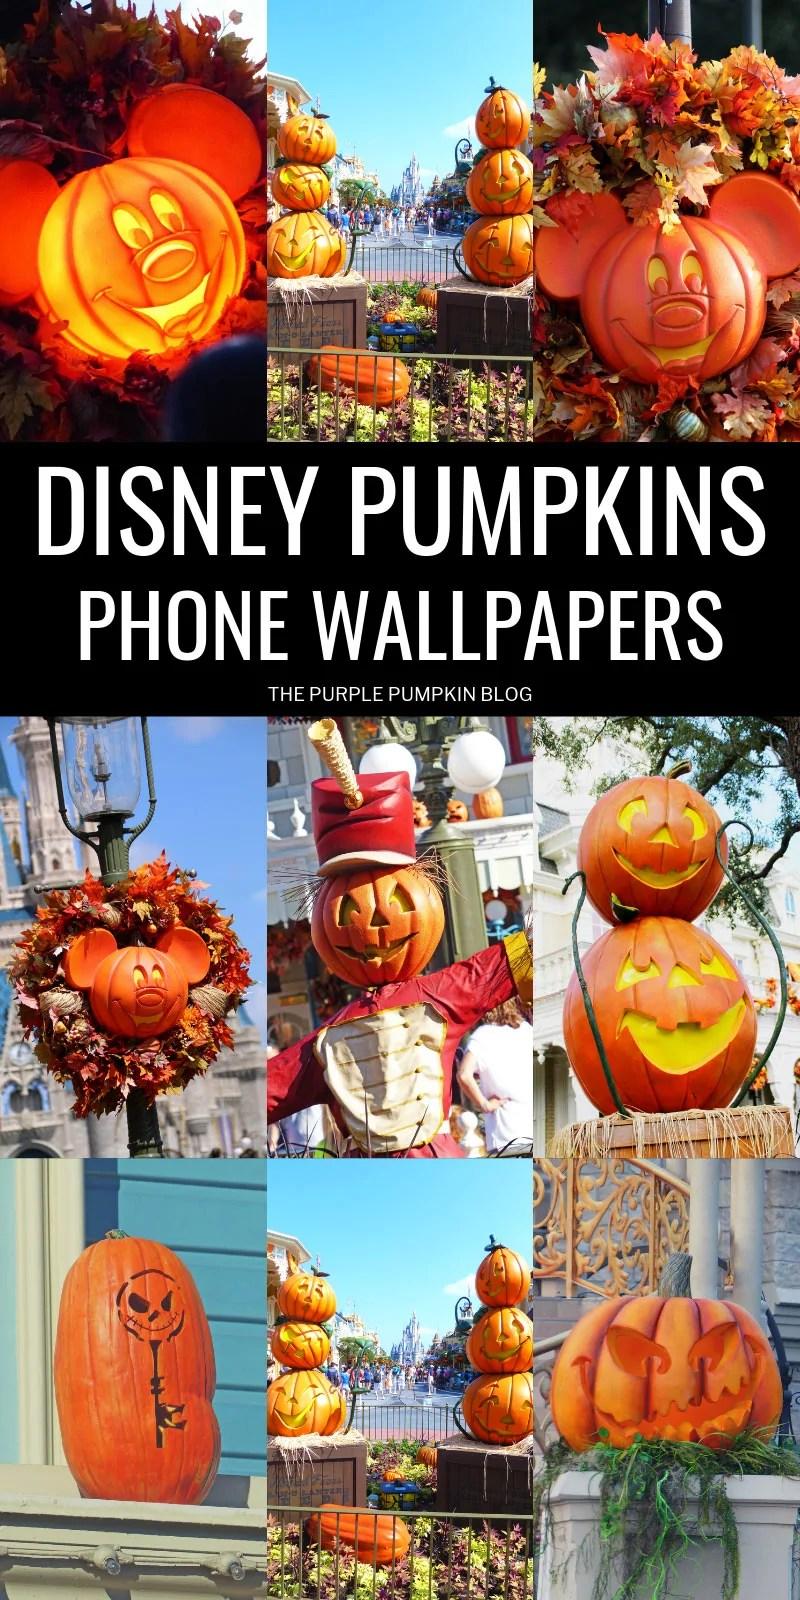 Disney Pumpkins Phone Wallpapers